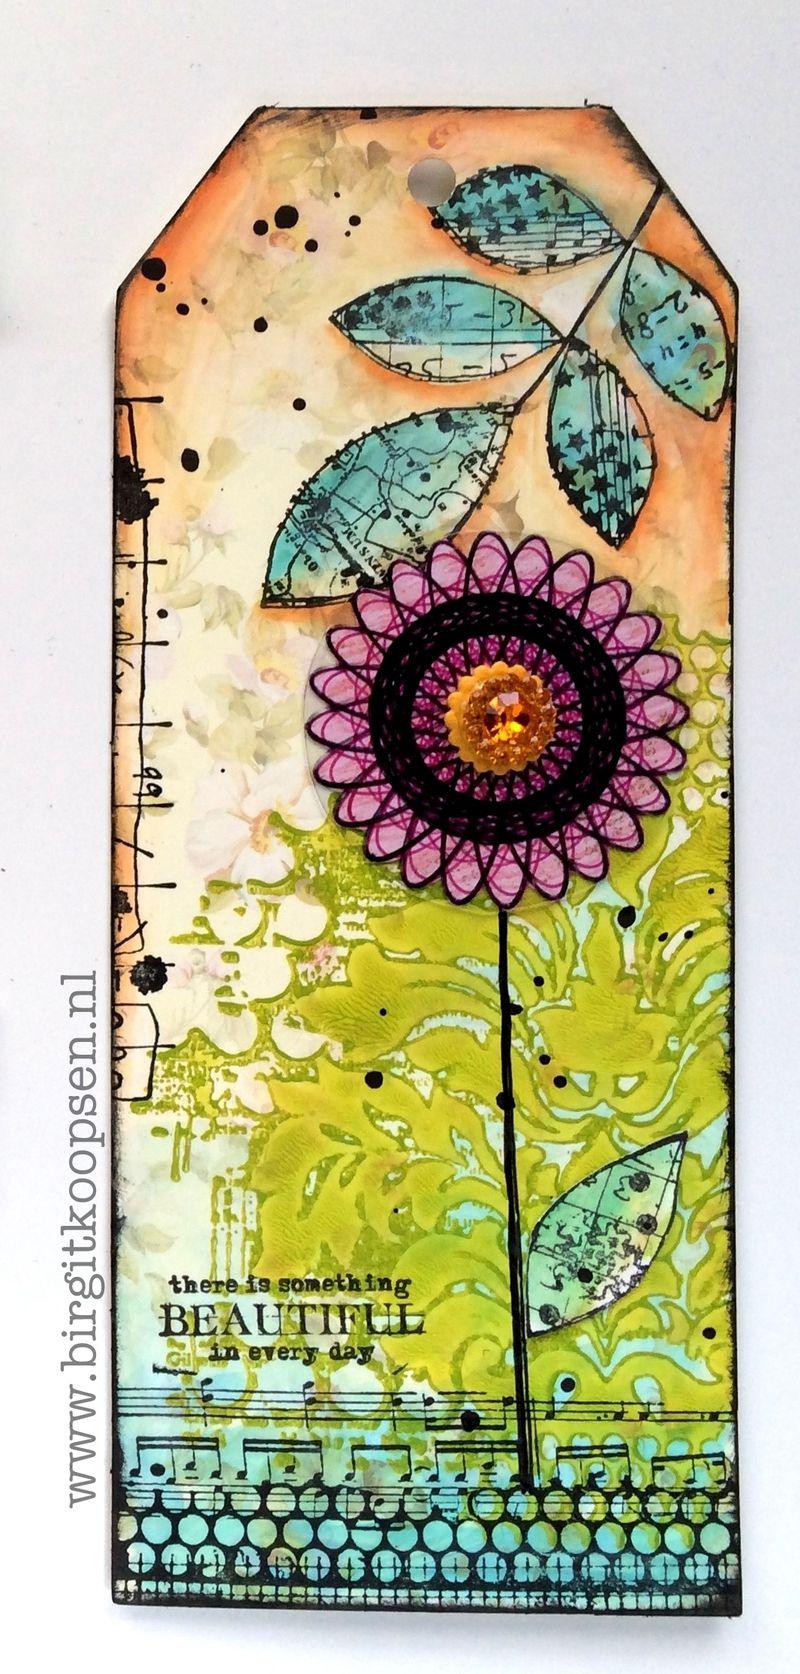 Birgit Koopsen - my stamps with Carabelle - something beautiful tag